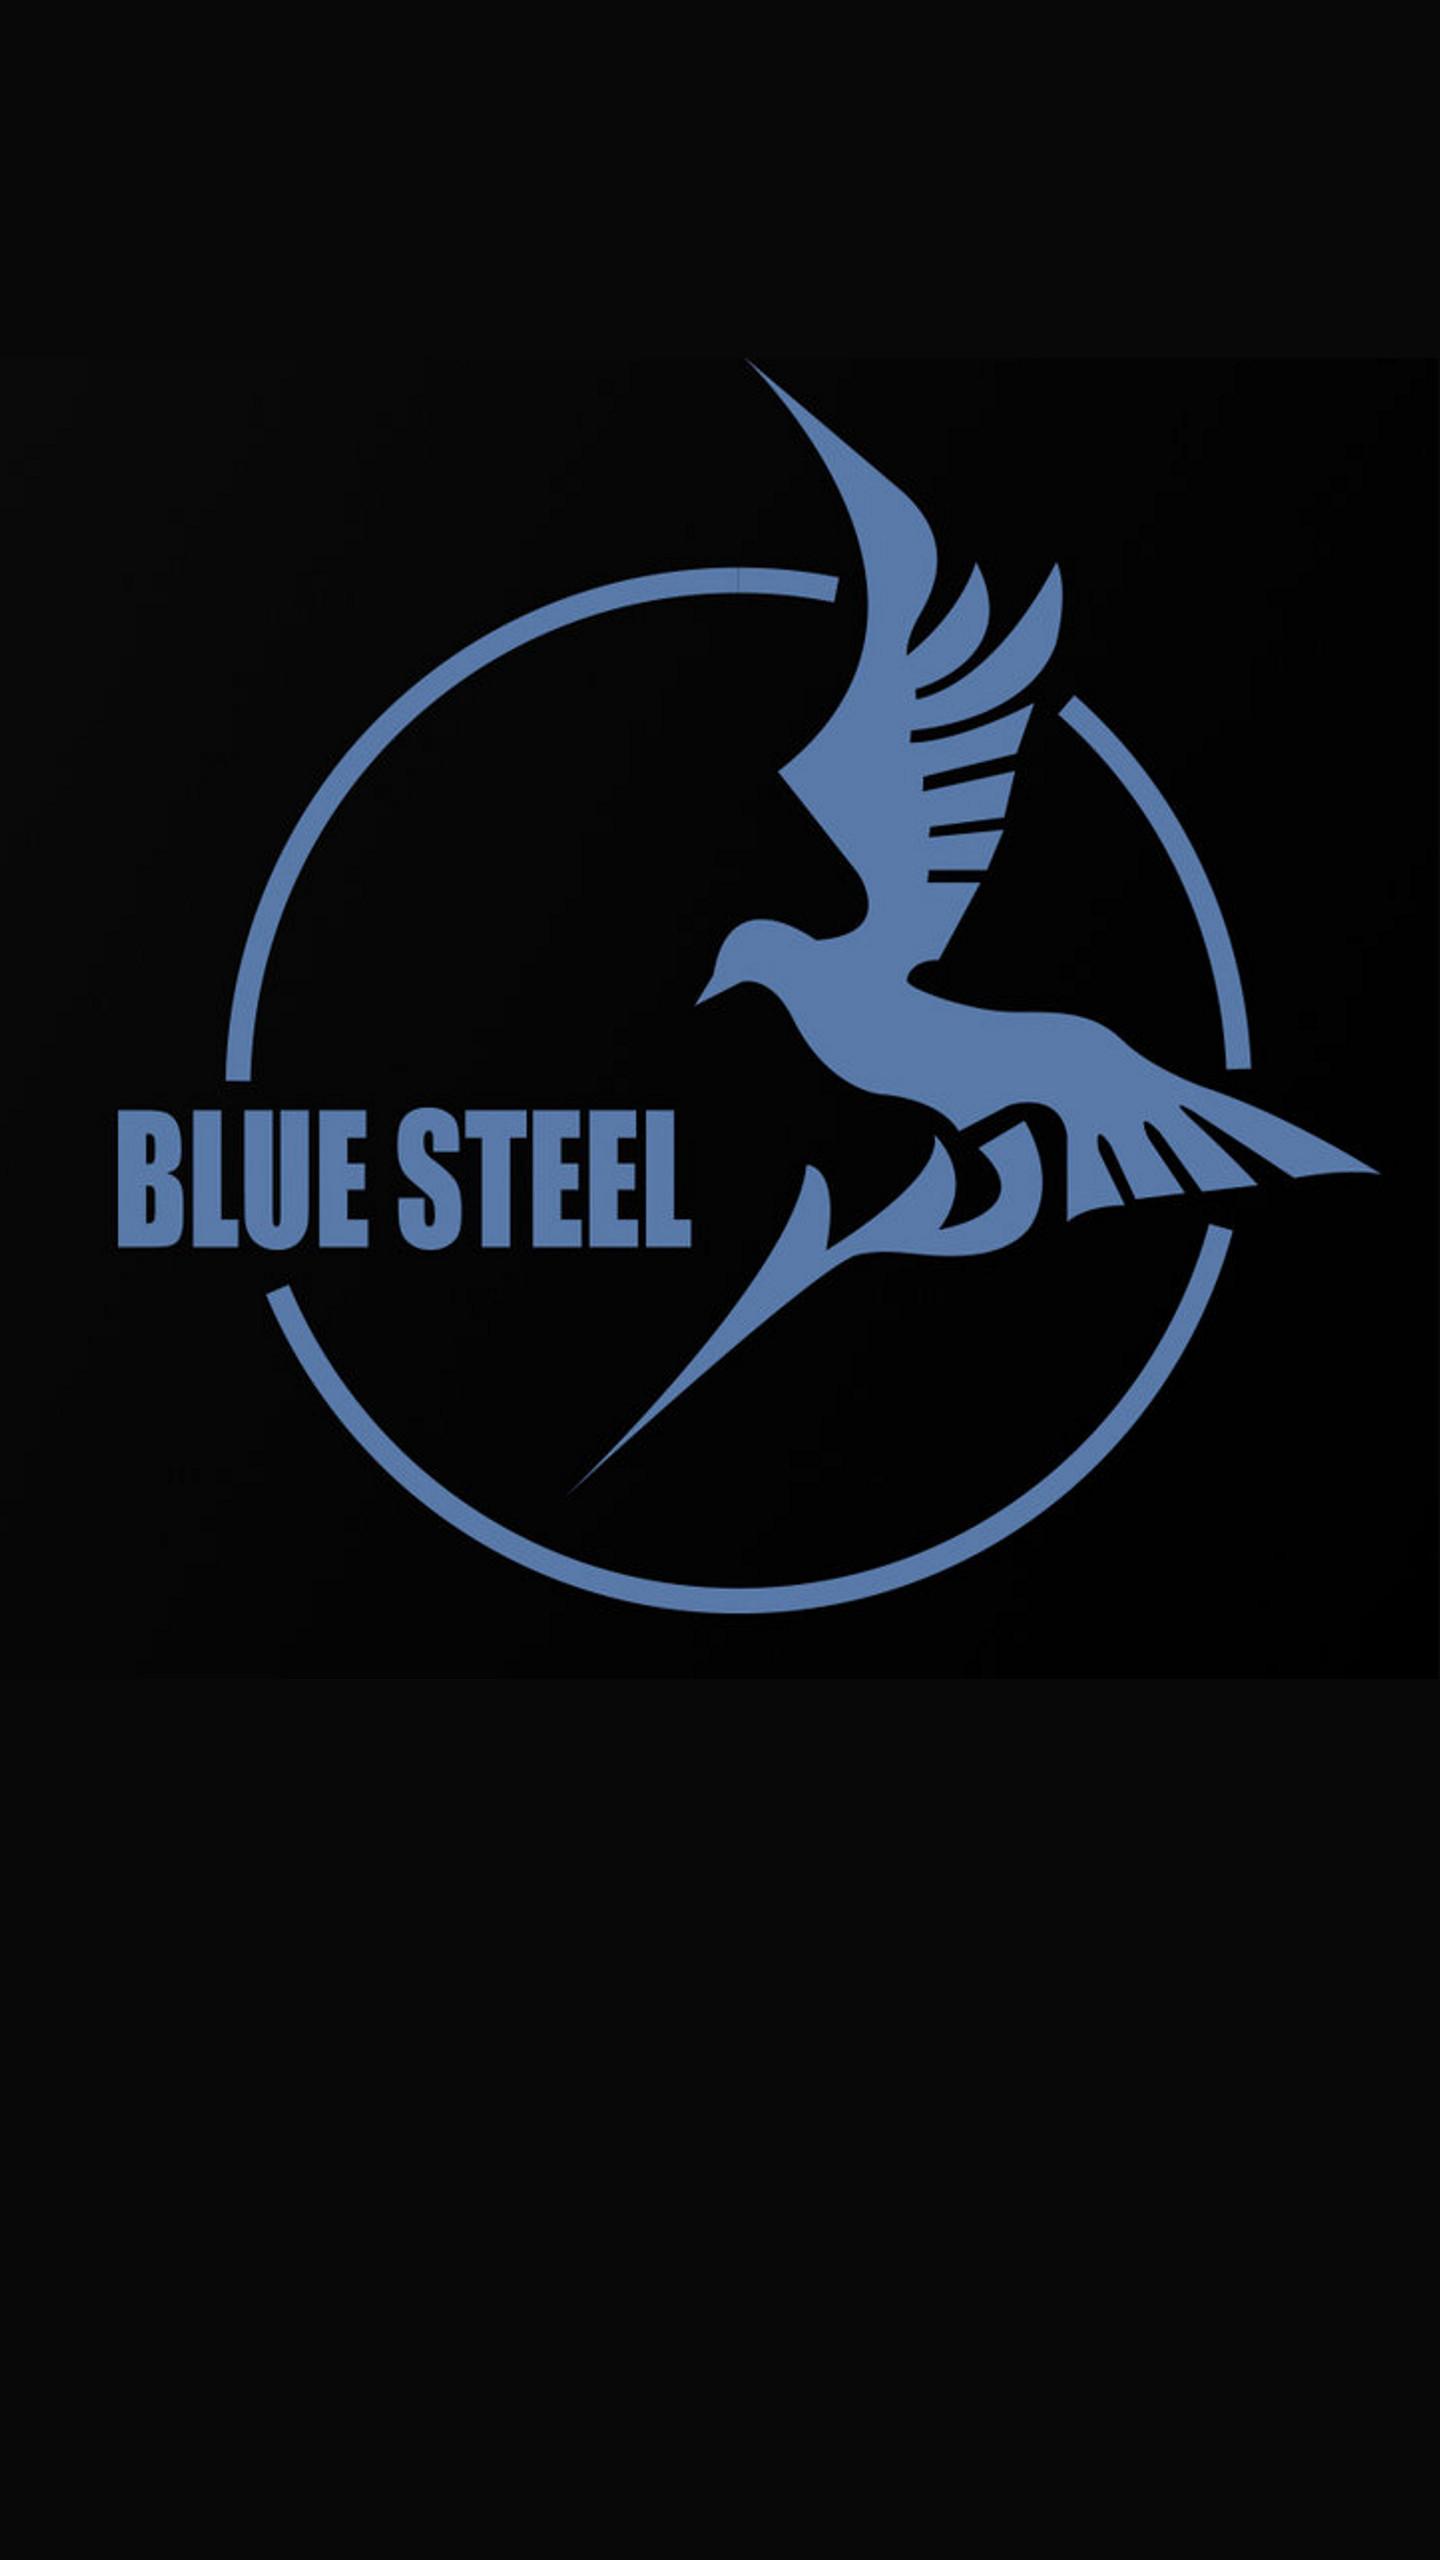 The Arpeggio of Blue Steel Logo …